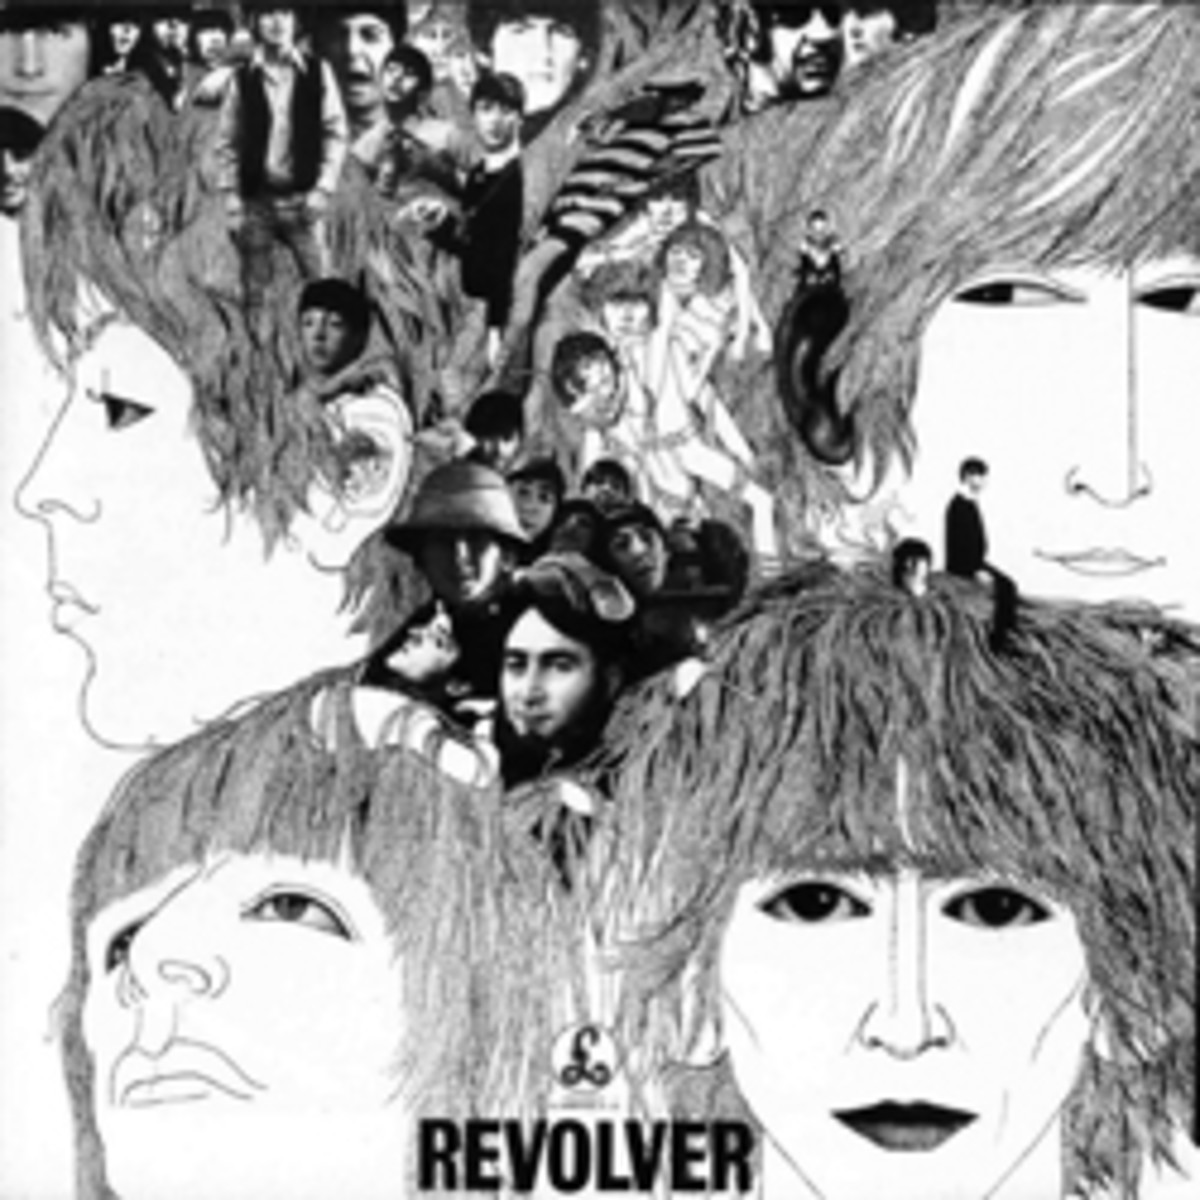 beatles_revolver